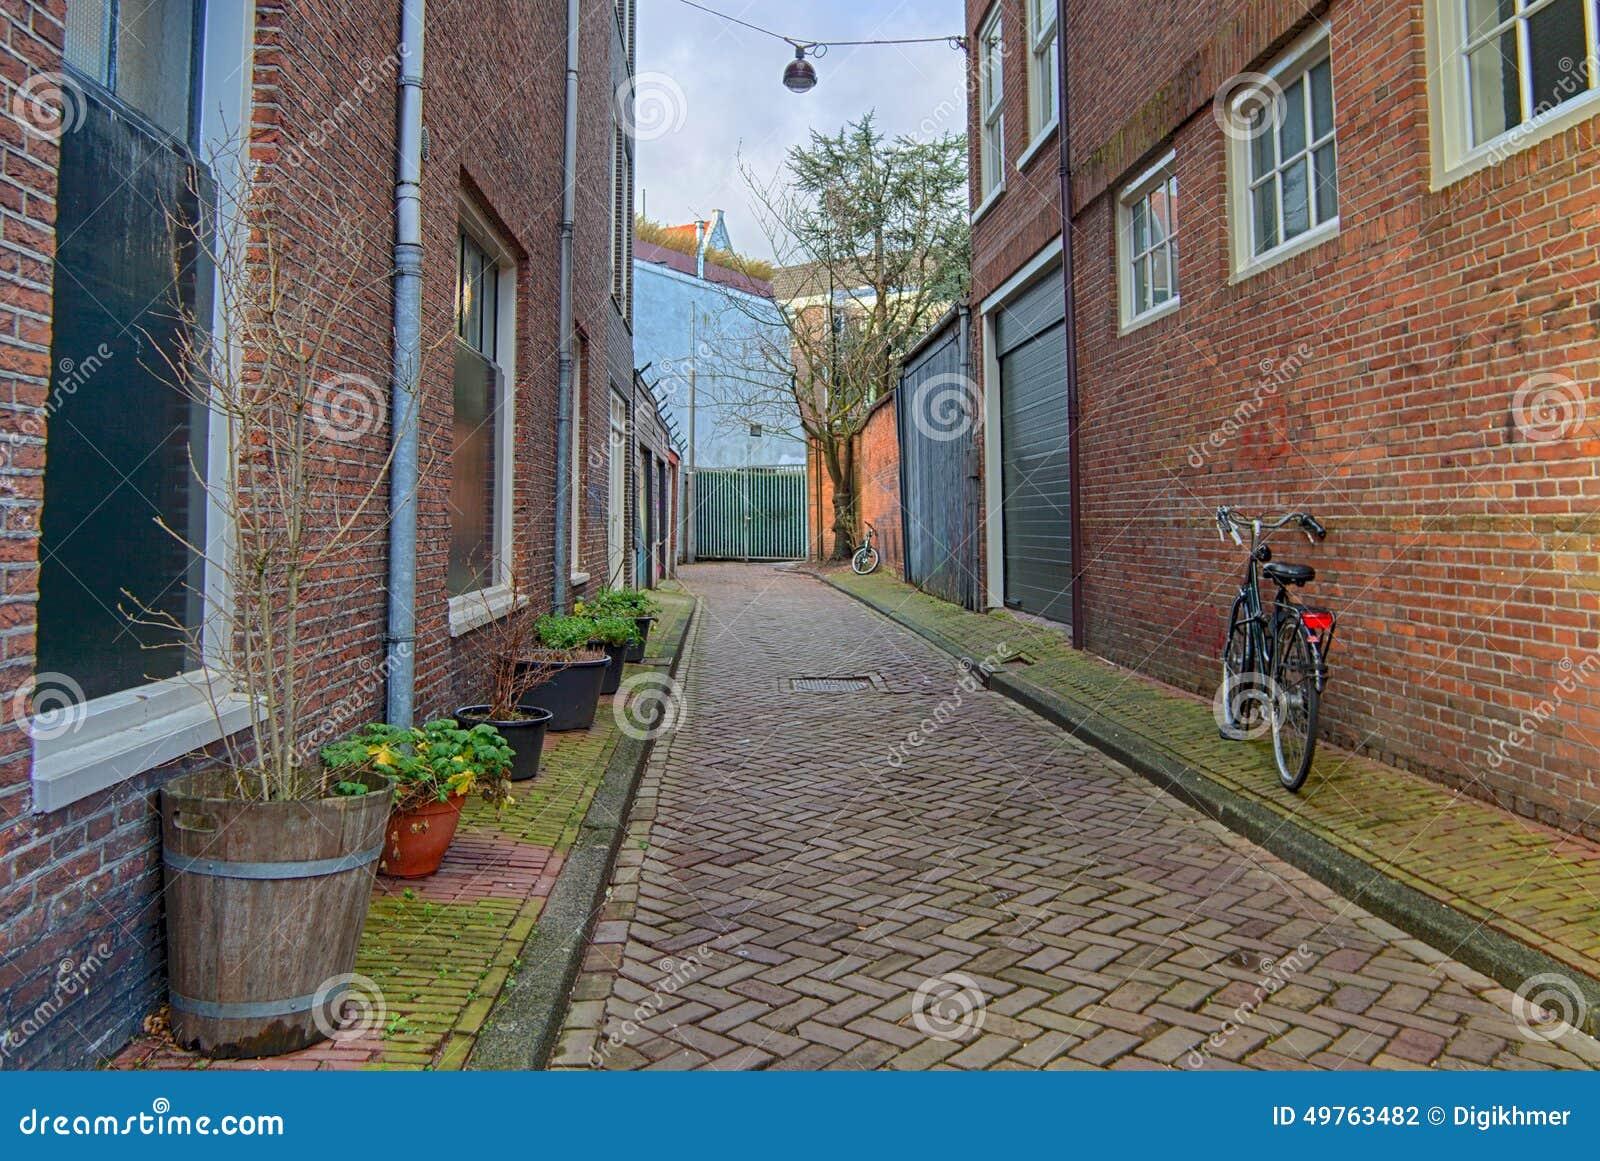 Amsterdam green street life